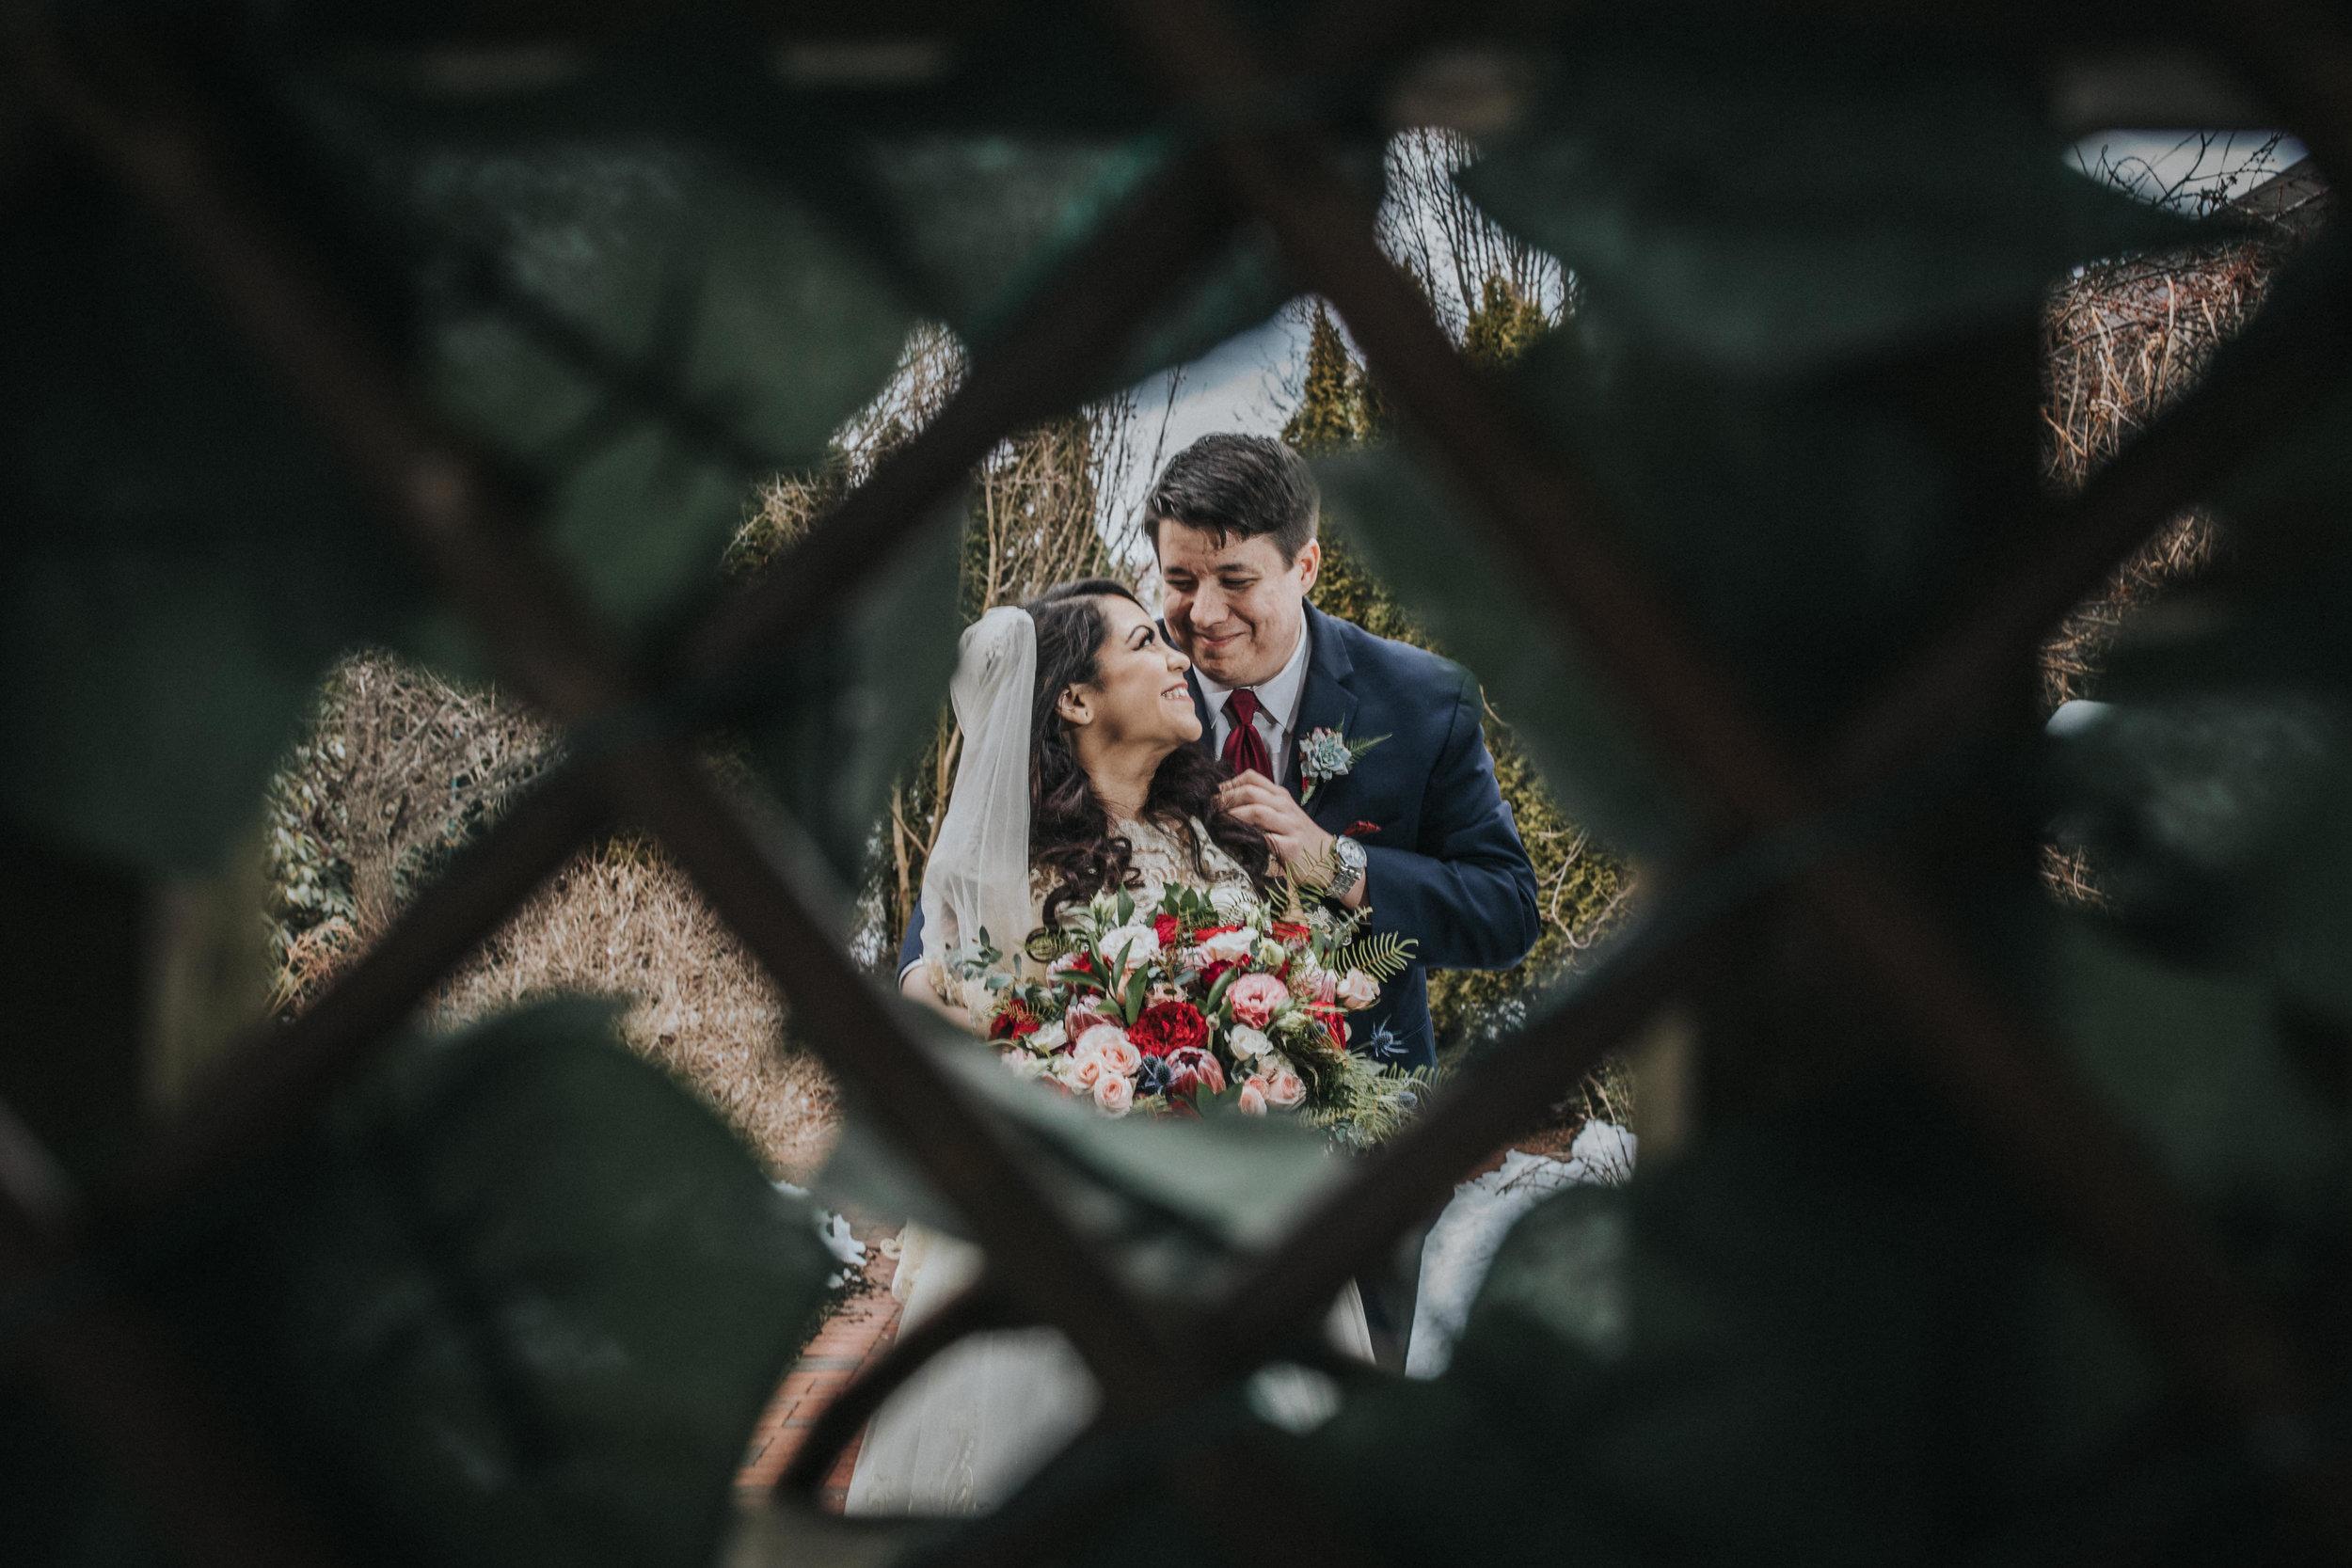 New-Jersey-Wedding-Photographer-ReceptionCenter-Valeria&Mike-First-Look-Bride&Groom (46 of 69).jpg